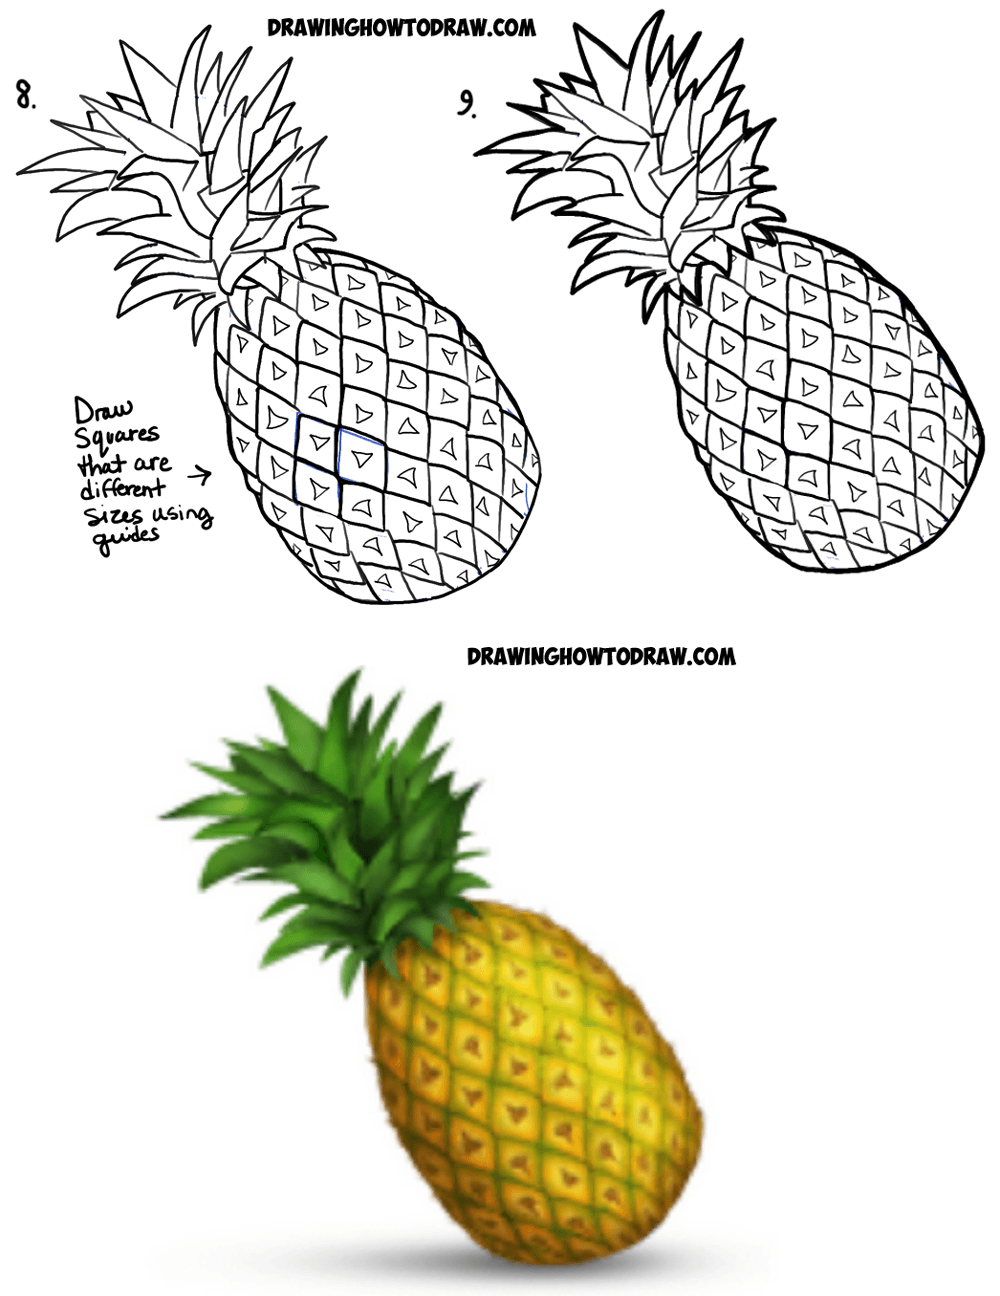 howtodraw-pineapple-emoji-stepbystep-02jpg